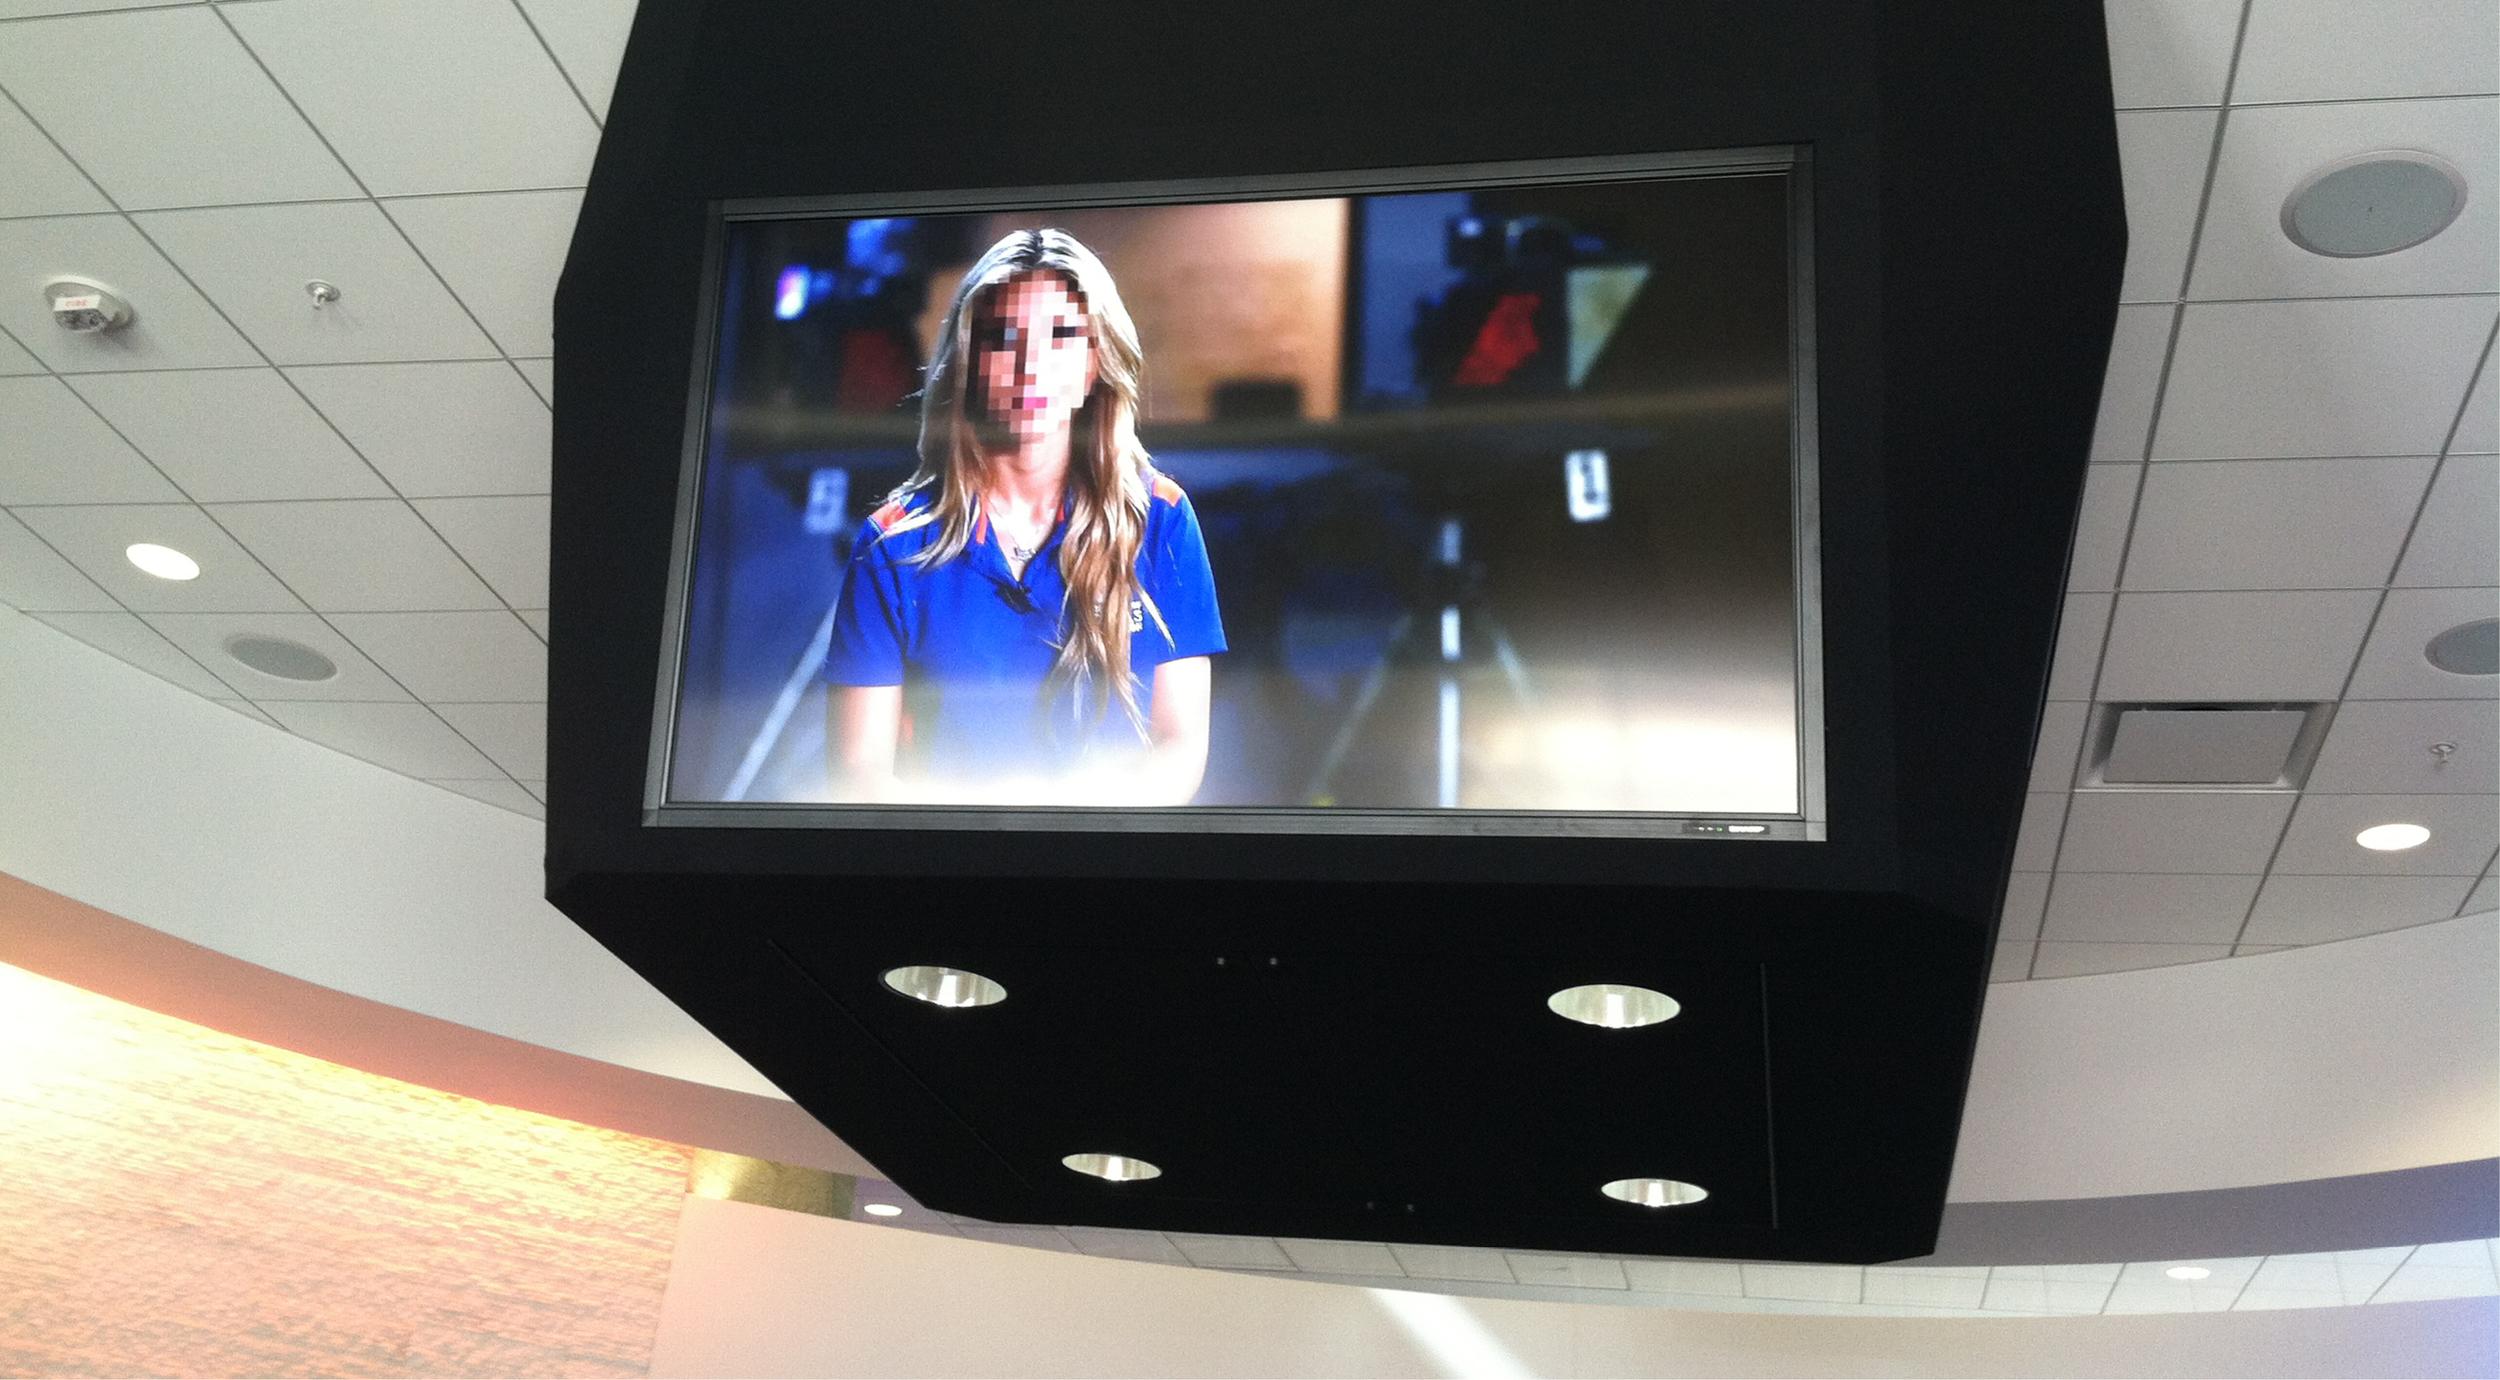 UTA_WC_Video_Slides4.jpg